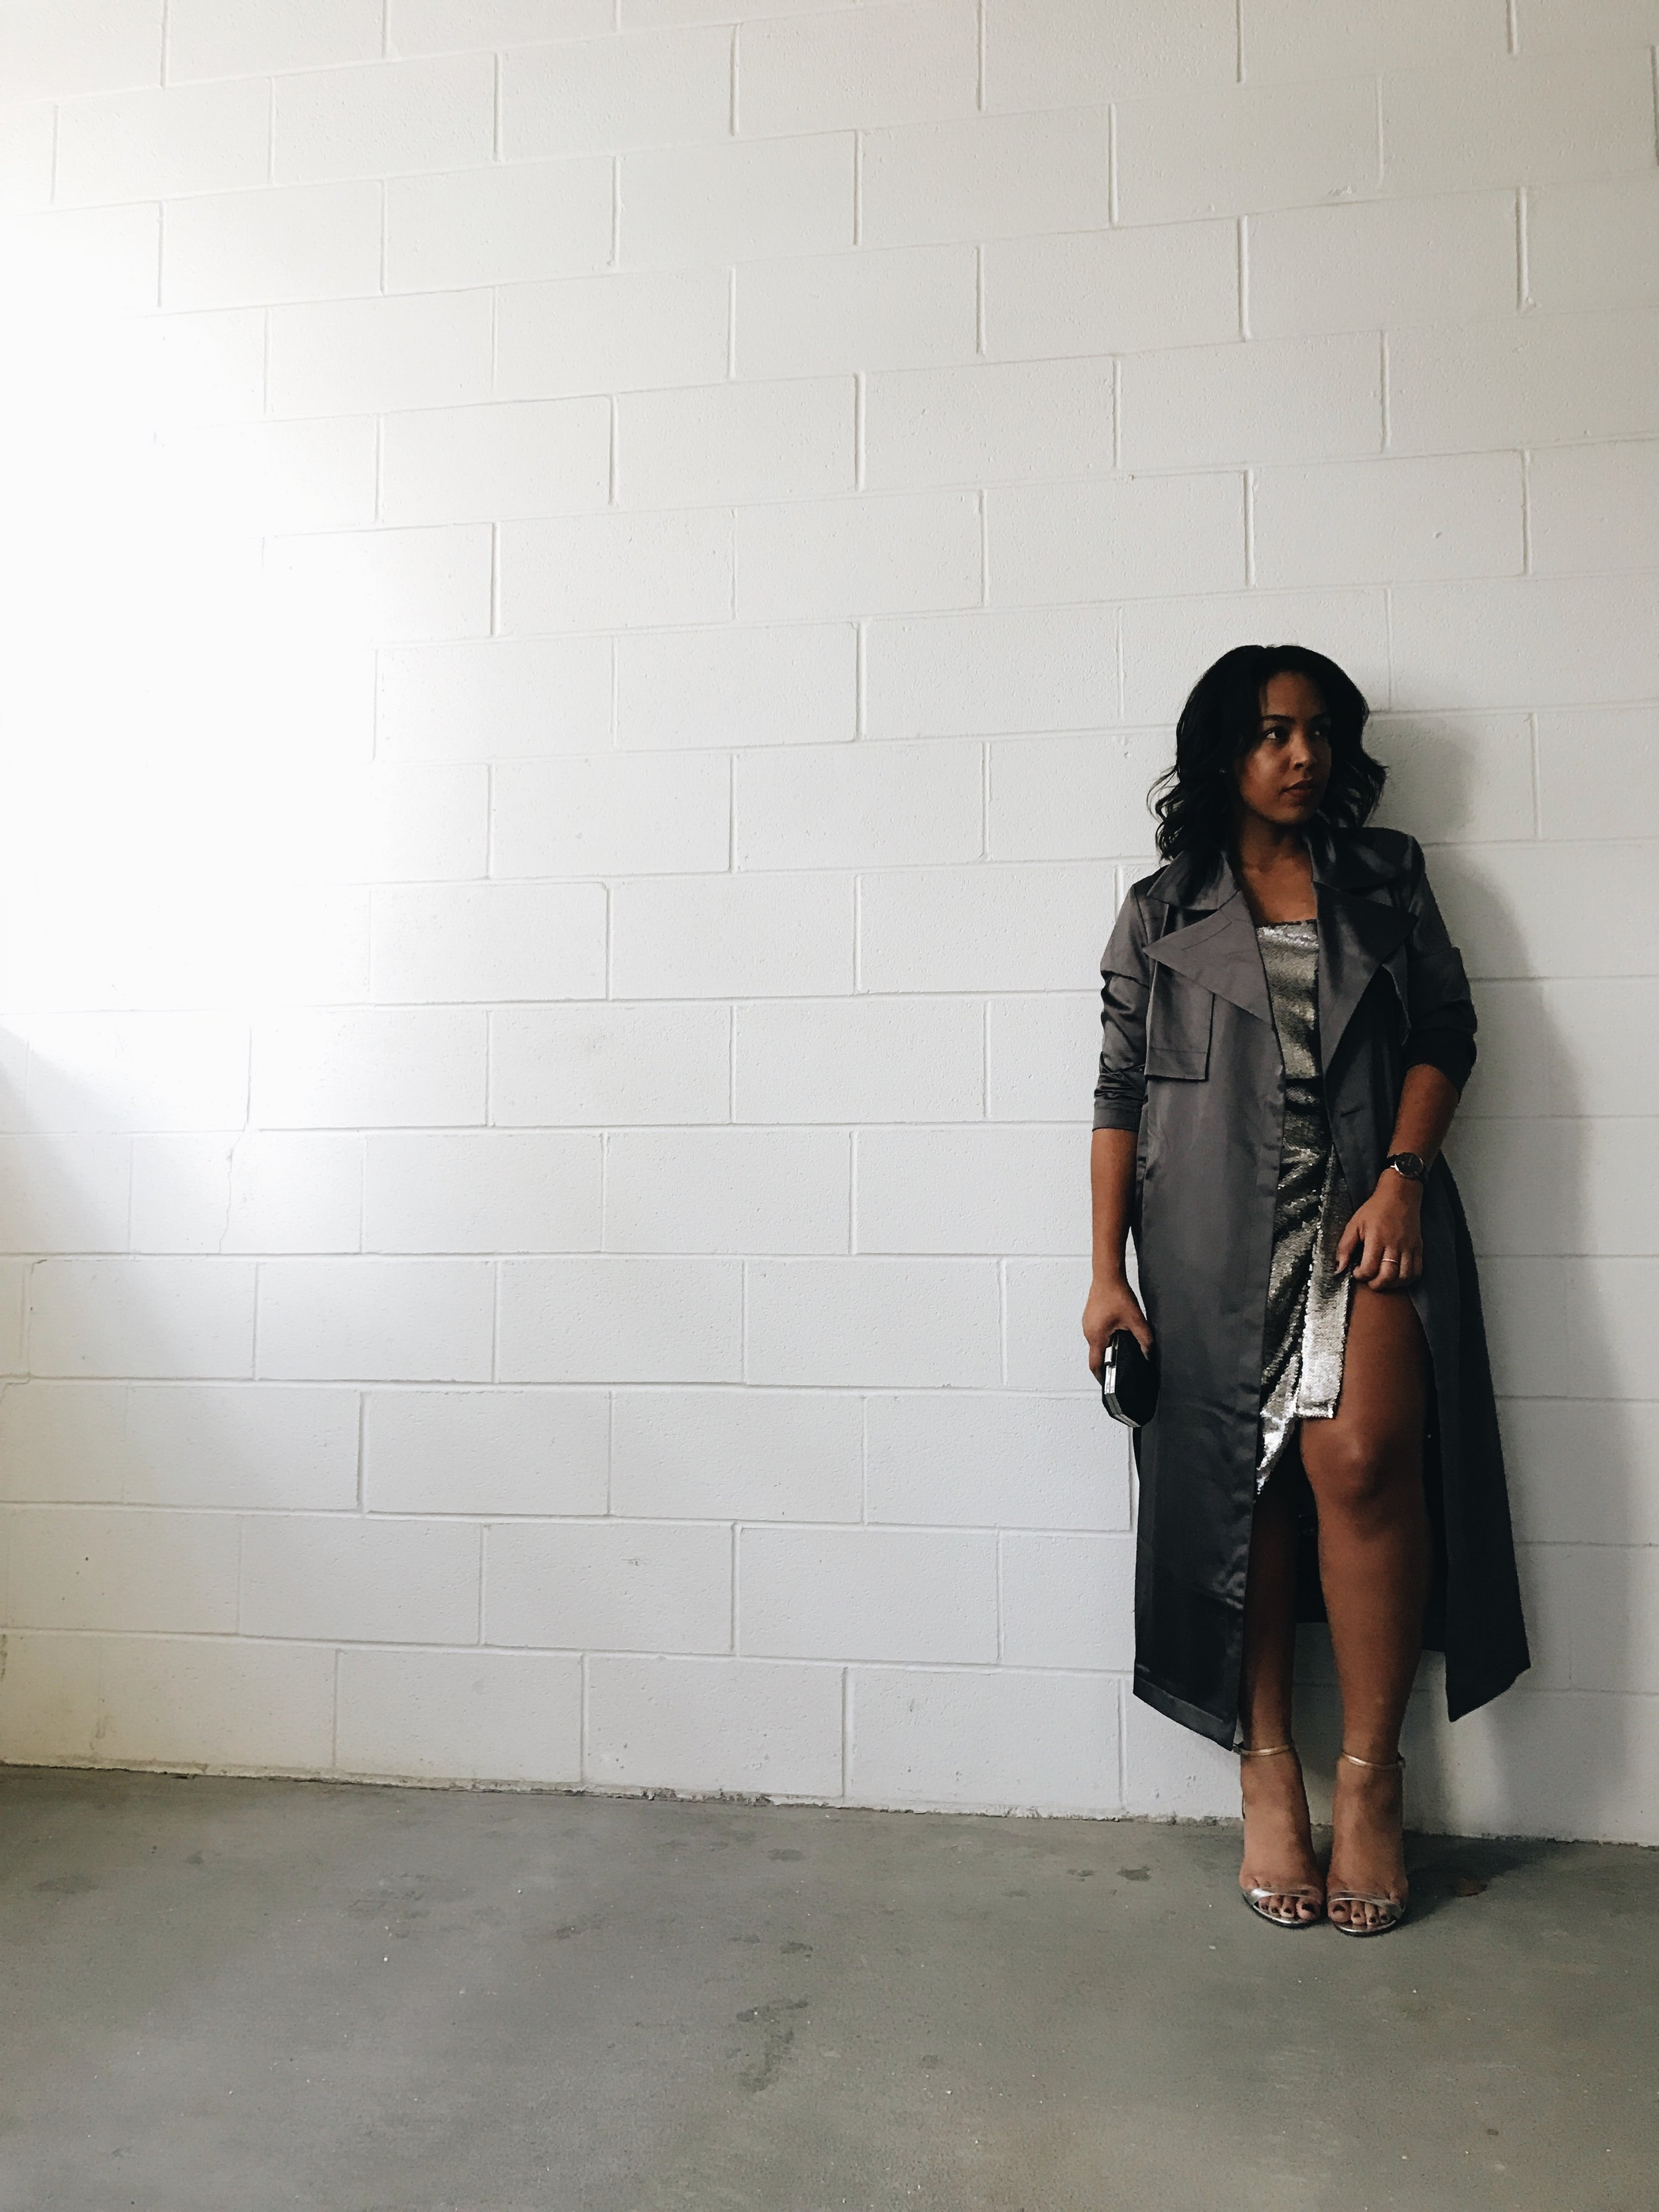 2-Lavish-Alice-Sequin-Dress-ASOS-Satin-Trench-Coat-Metallic-Heels-NYE-outfit.jpg